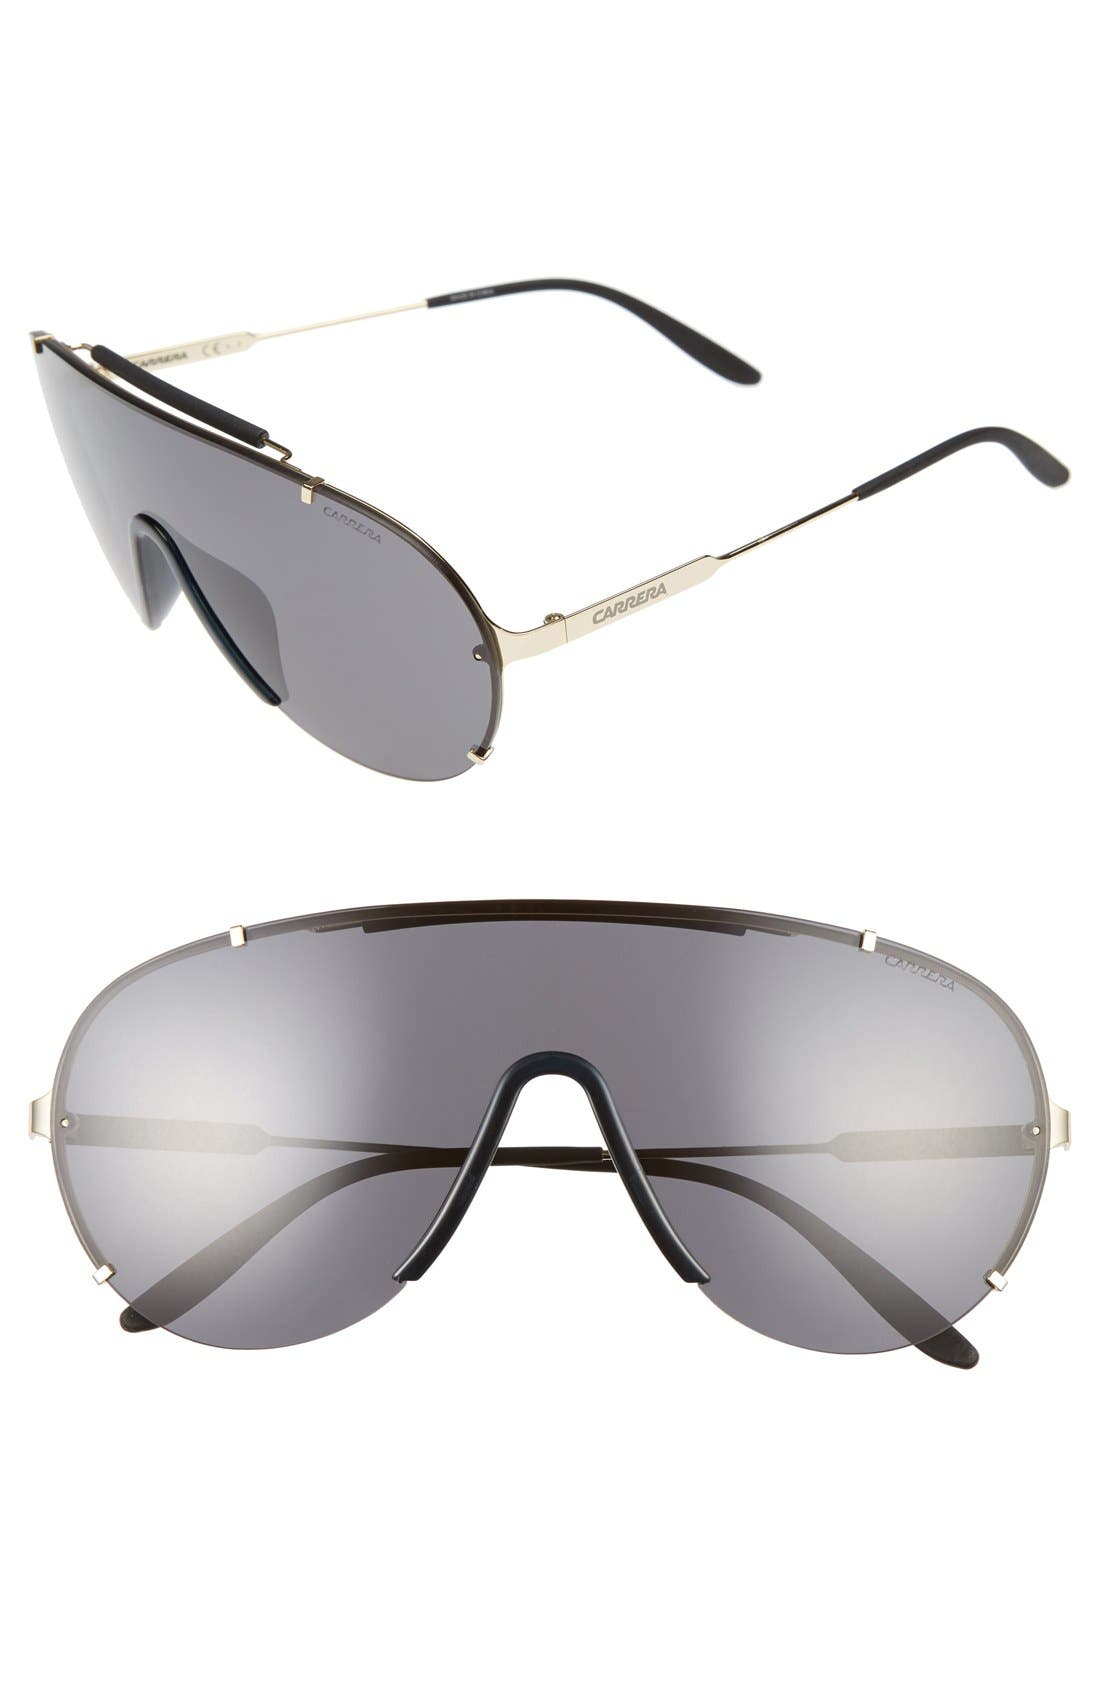 Carrera Eyewear 99mm Sunglasses